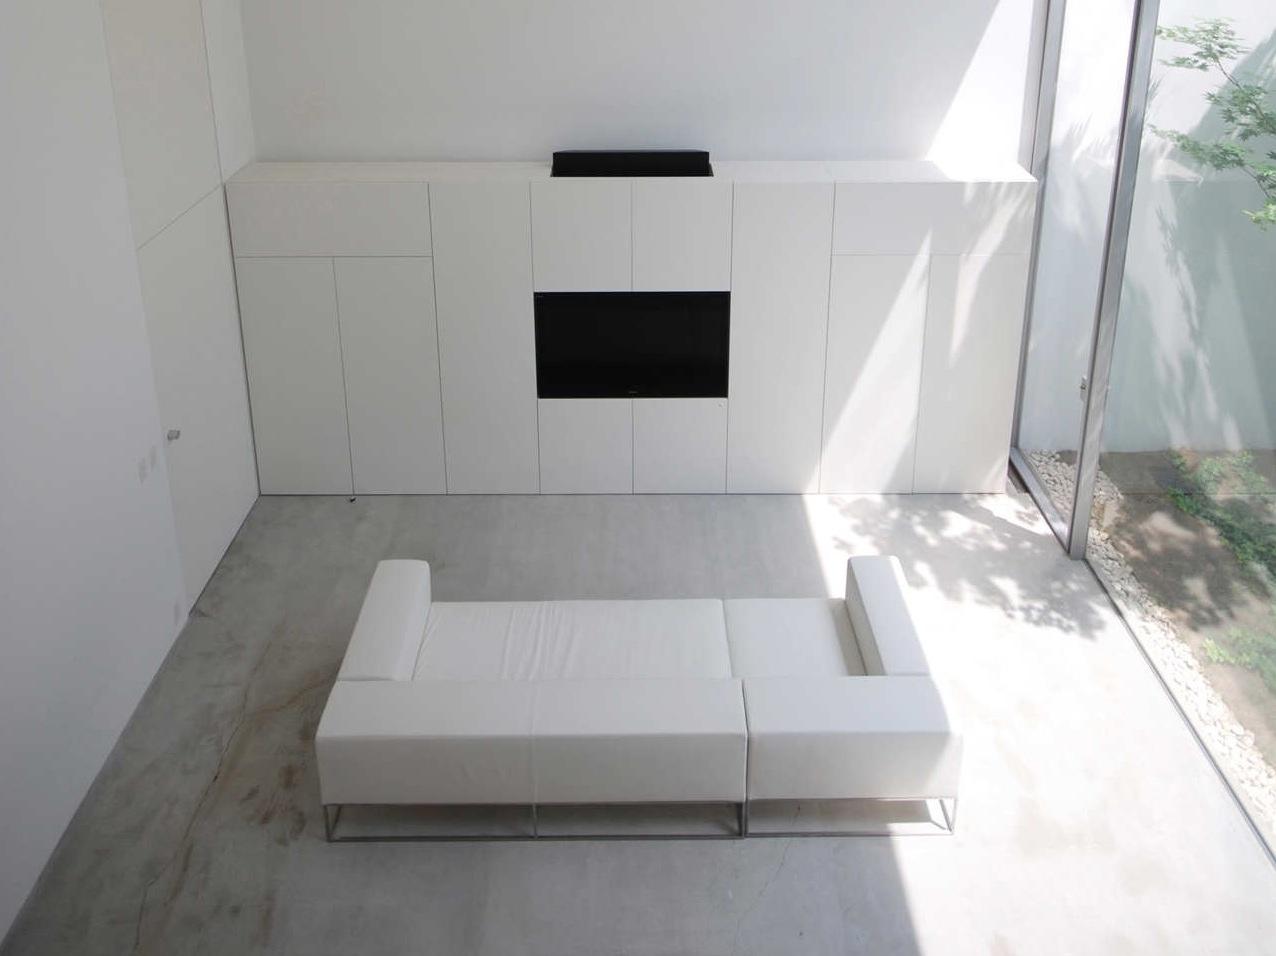 Architext by arrol gellner for Minimalist living in an rv